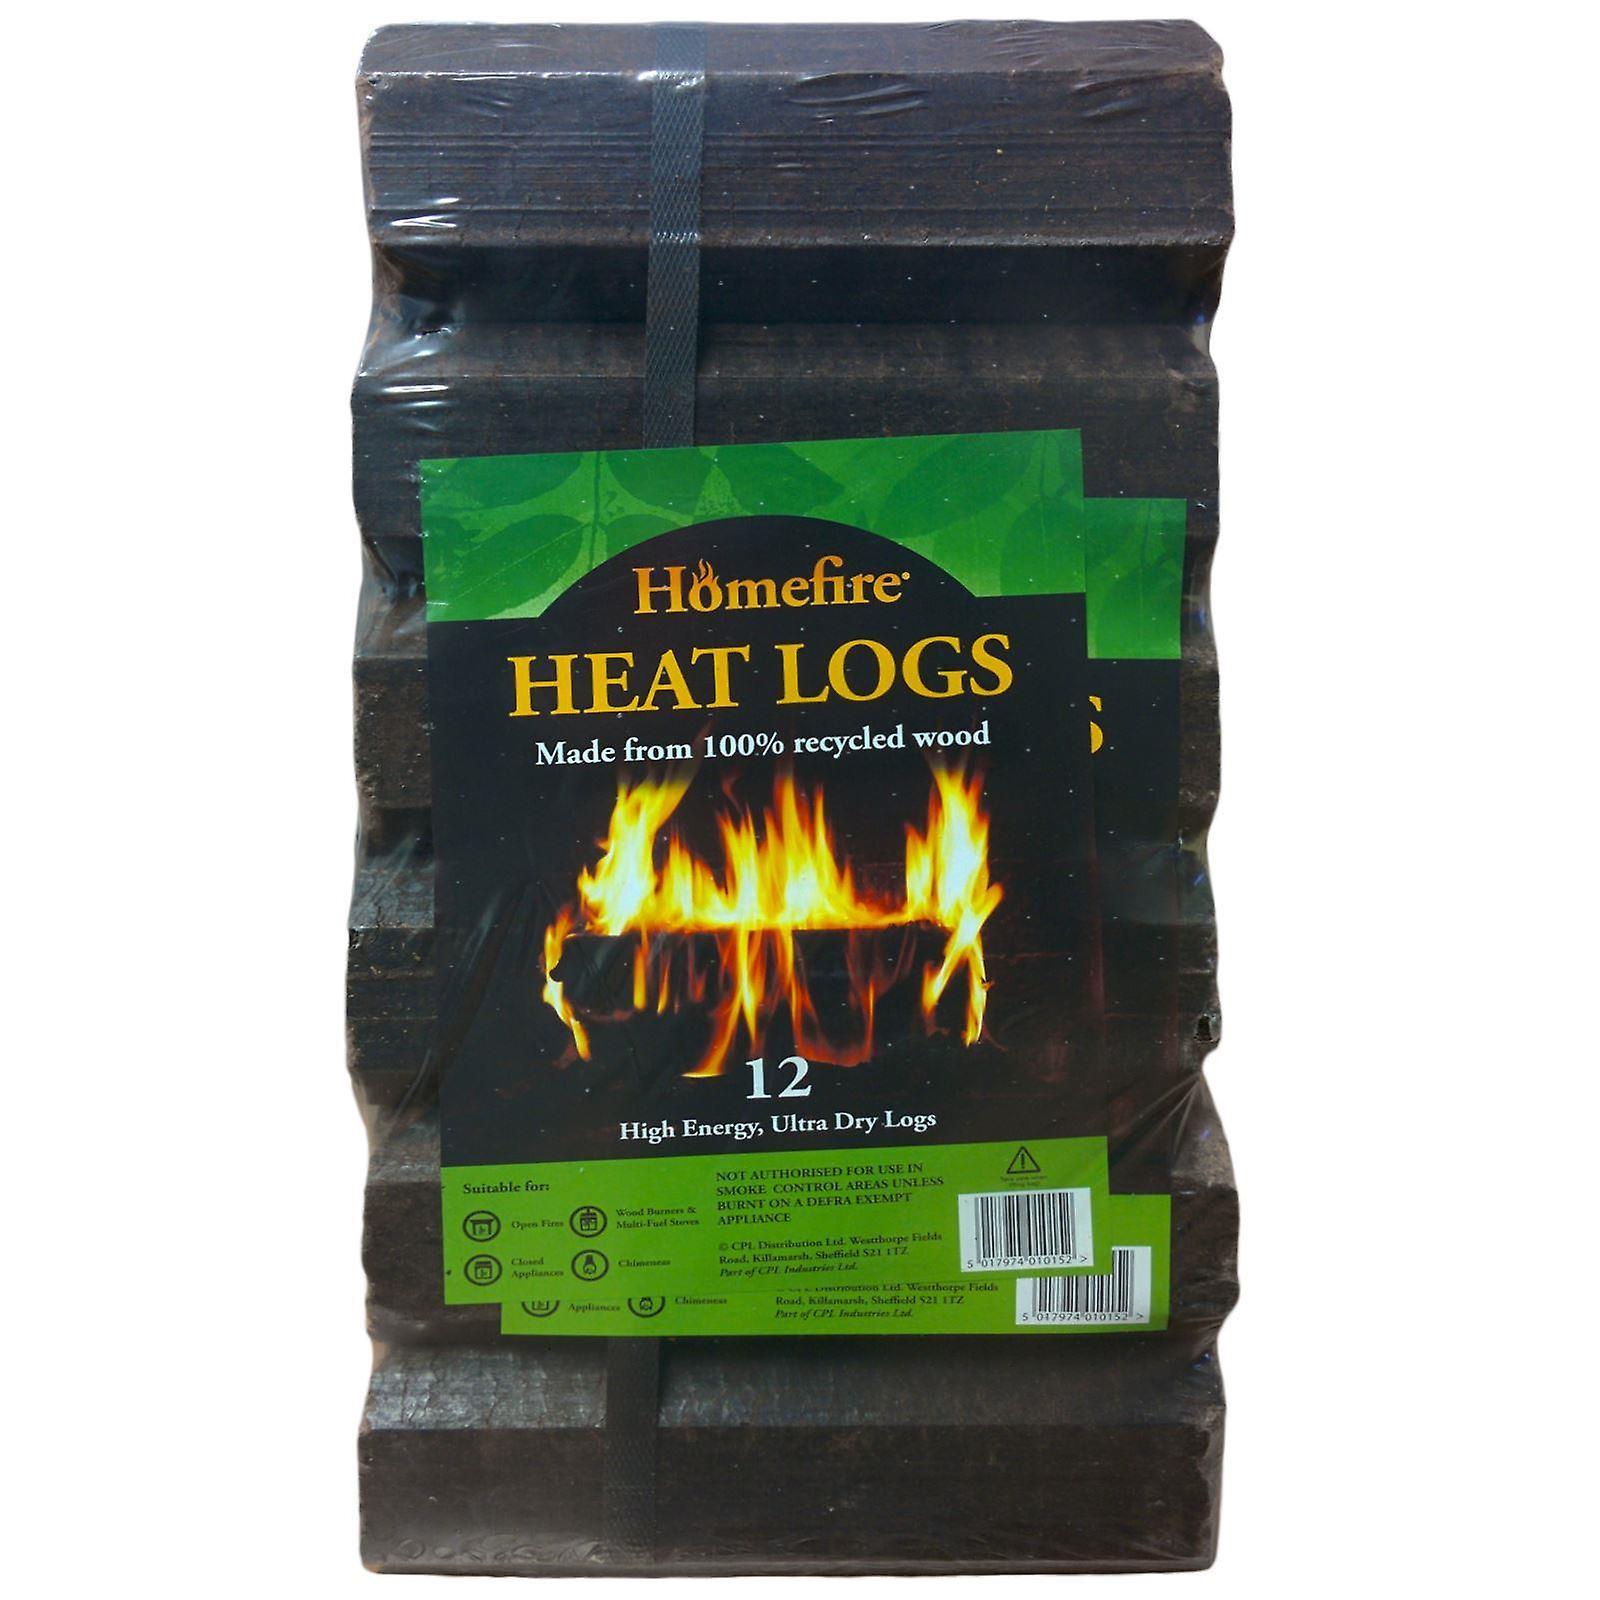 Homefire 12 High Energy Ultra Dry Heat Logs